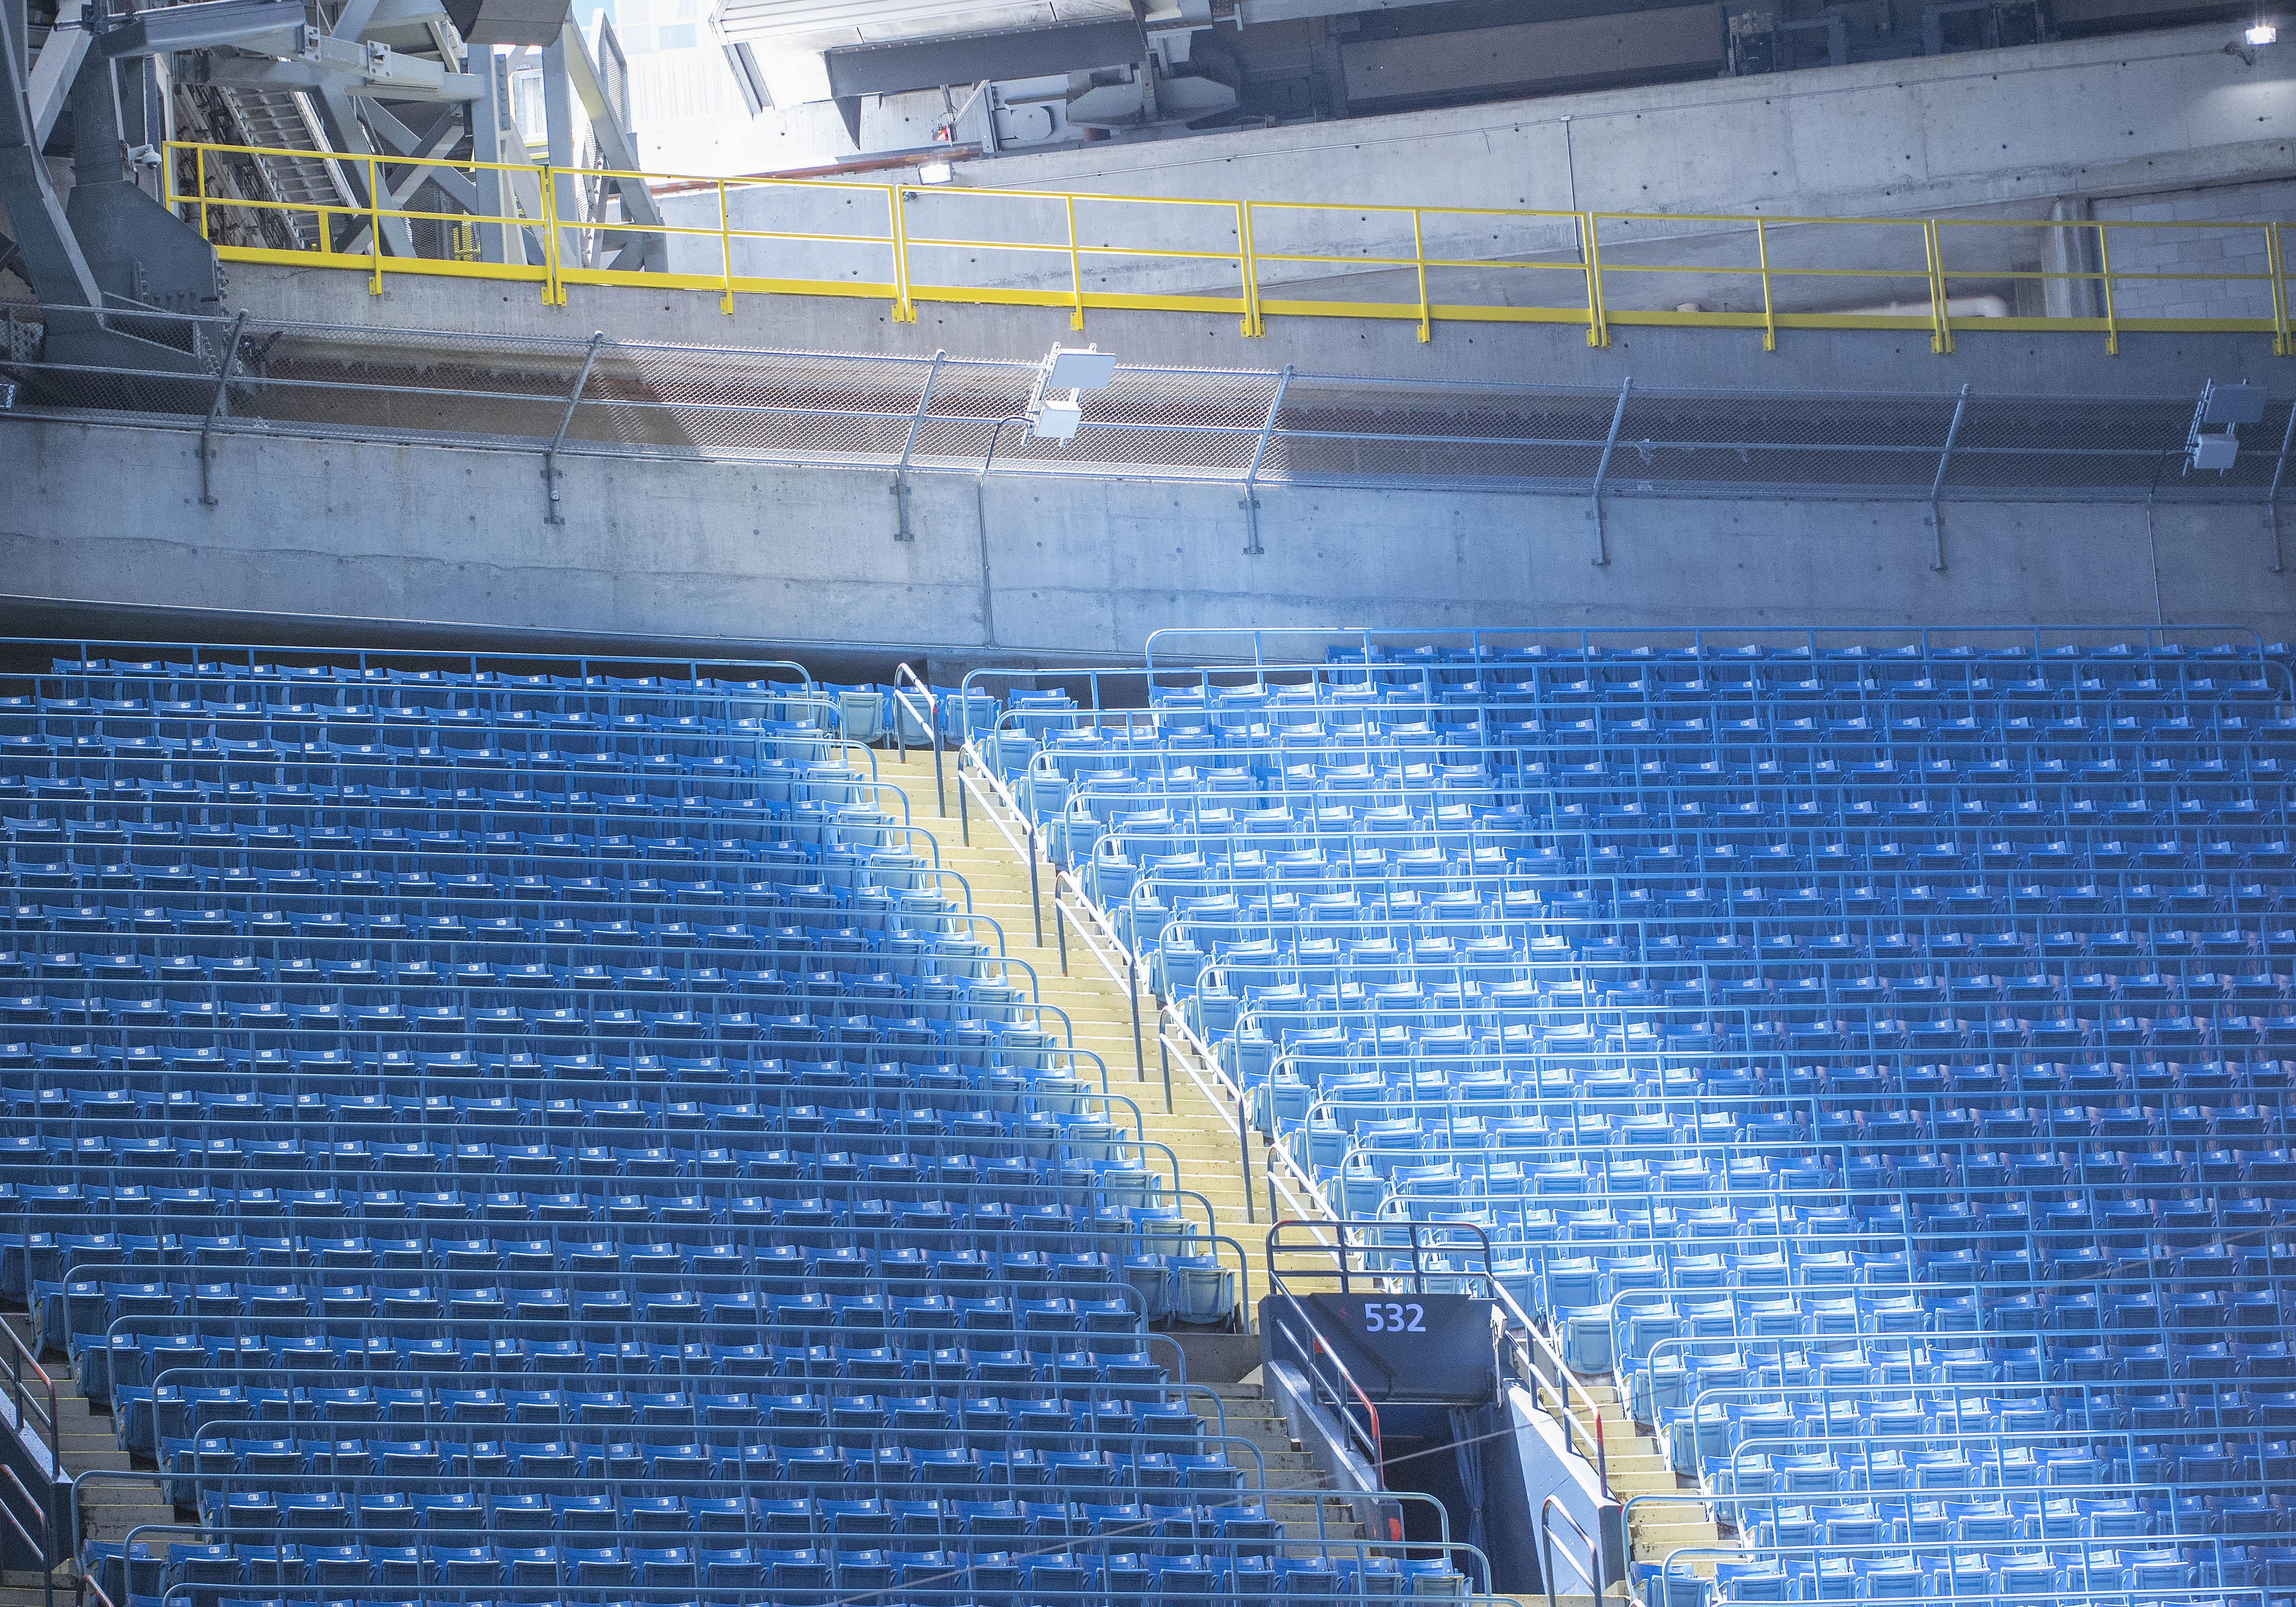 MLB: Washington Nationals at Toronto Blue Jays